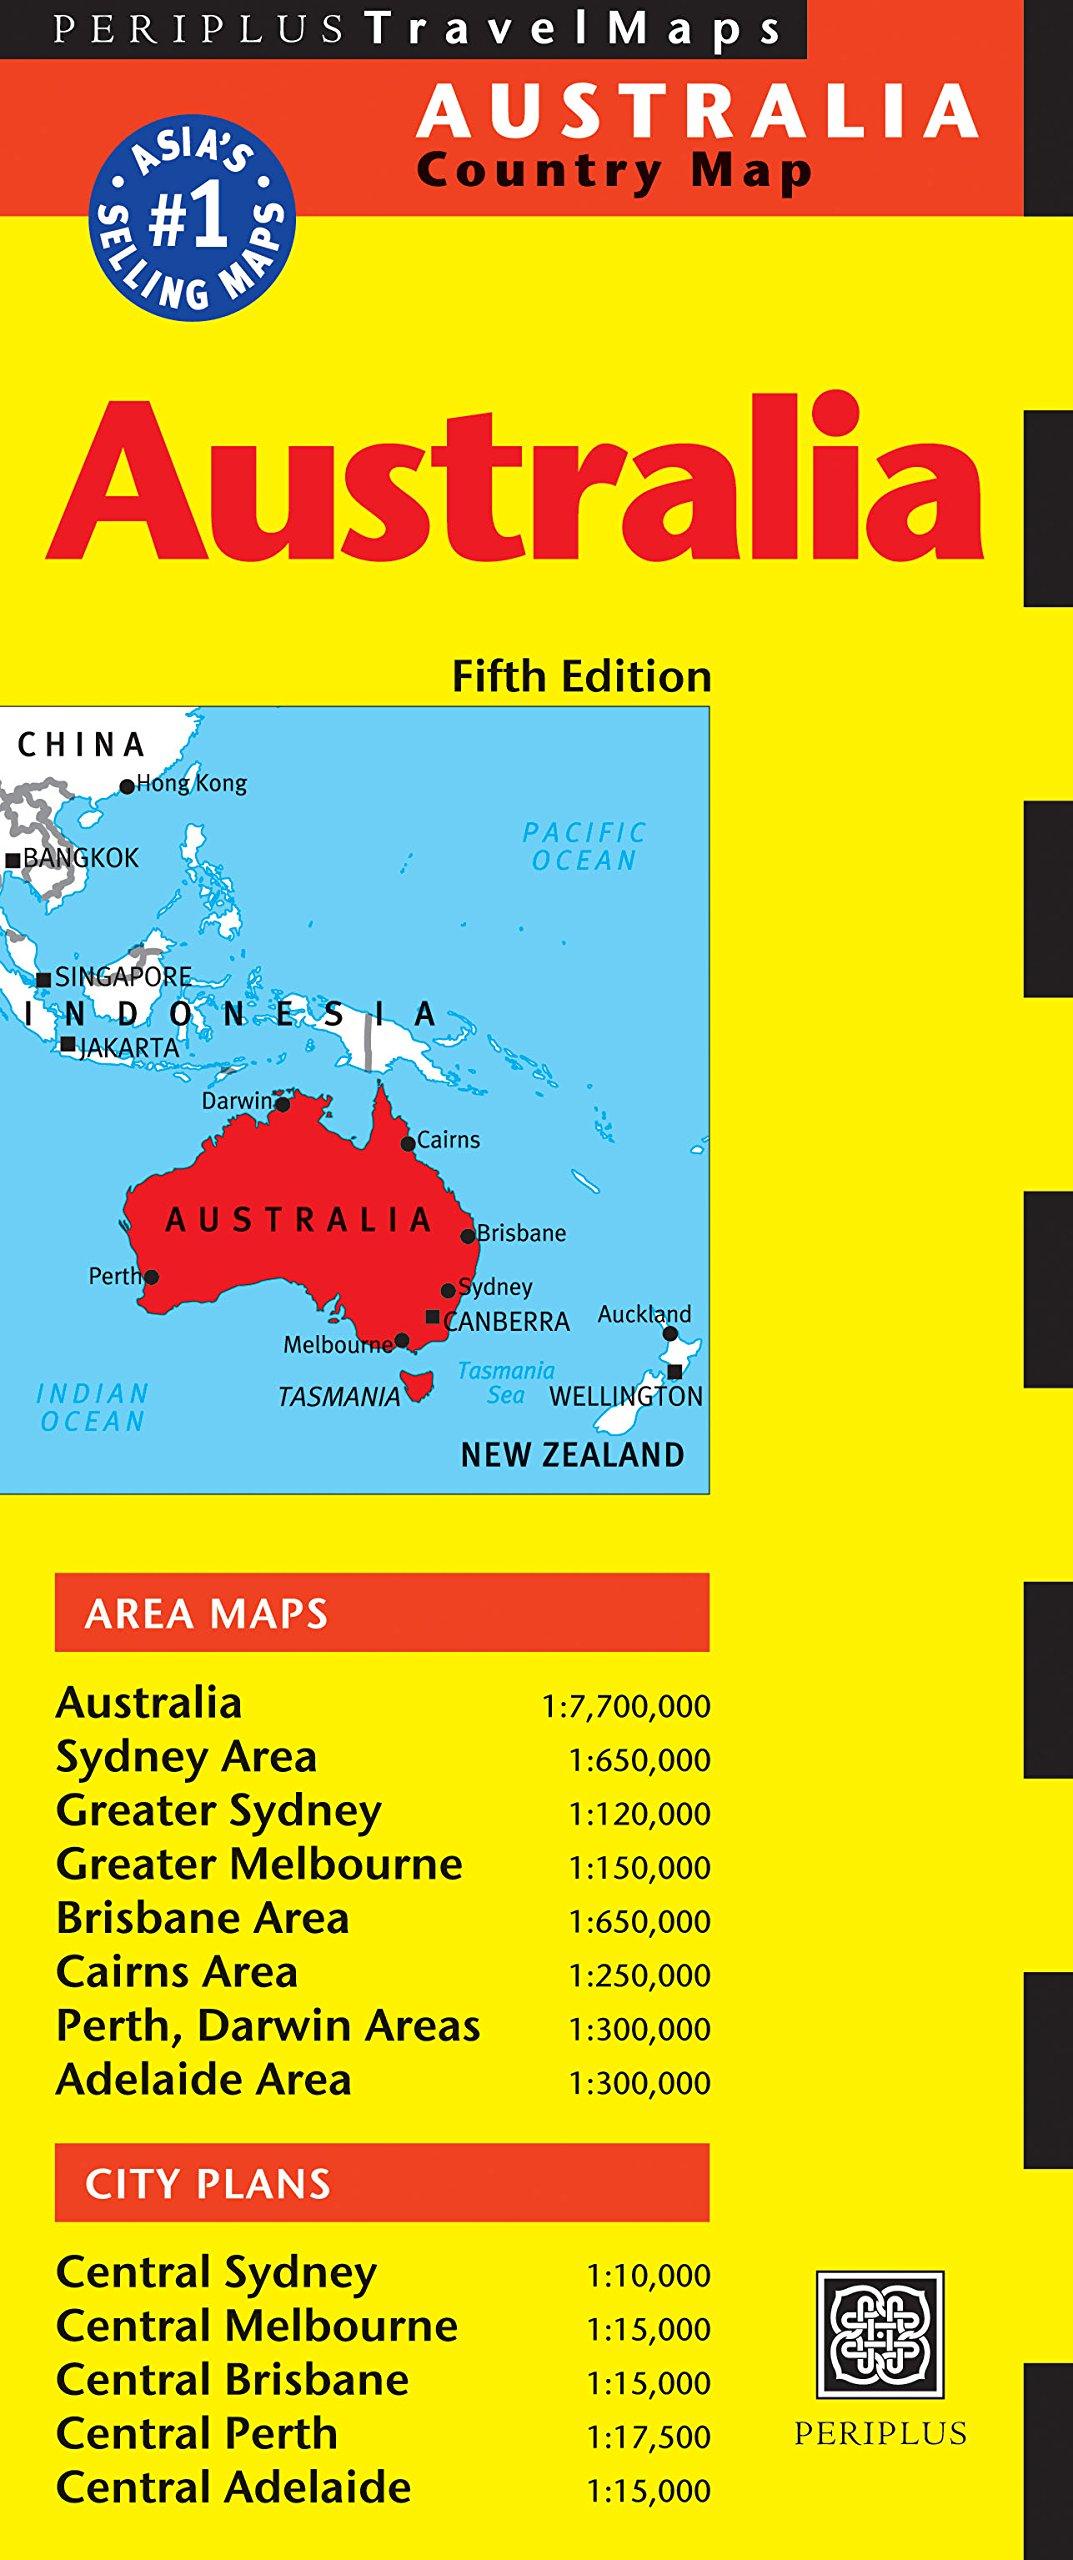 Australia Major Cities Map.Australia Travel Map Fifth Edition Periplus Travel Maps Periplus